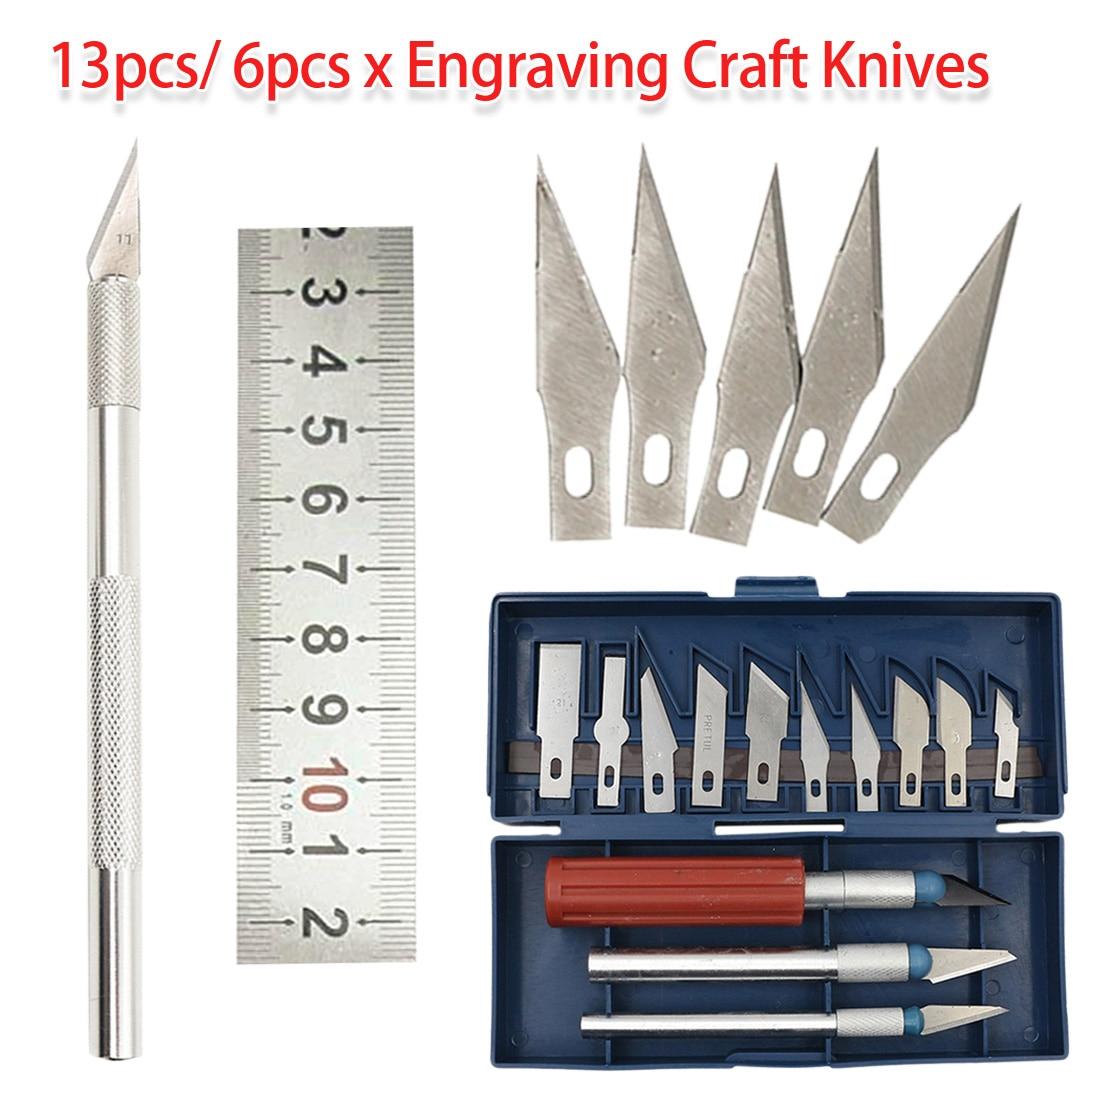 Cutter Engraving Craft Knives 13pcs/ 6pcs Metal Scalpel Knife Tool Kit For Mobile Phone PCB DIY Repair Tool Hand Tool Set